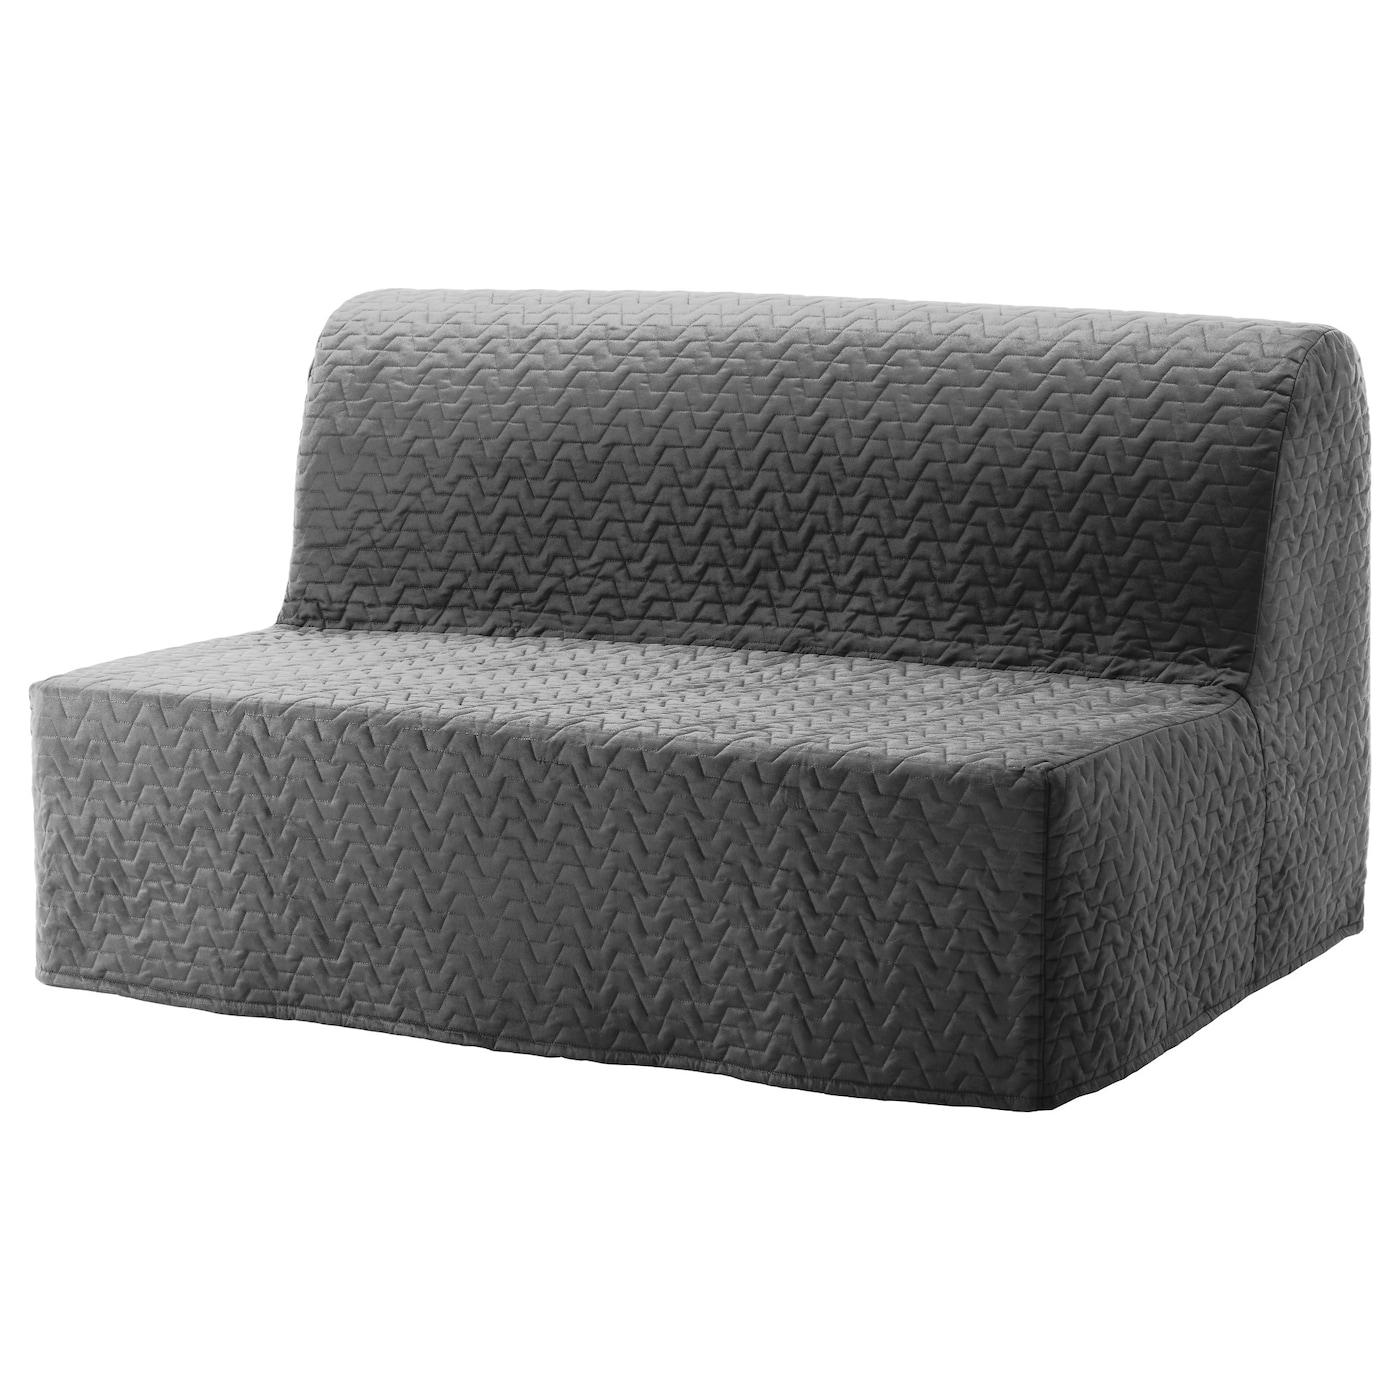 Lycksele Sleeper Sofa Slipcover